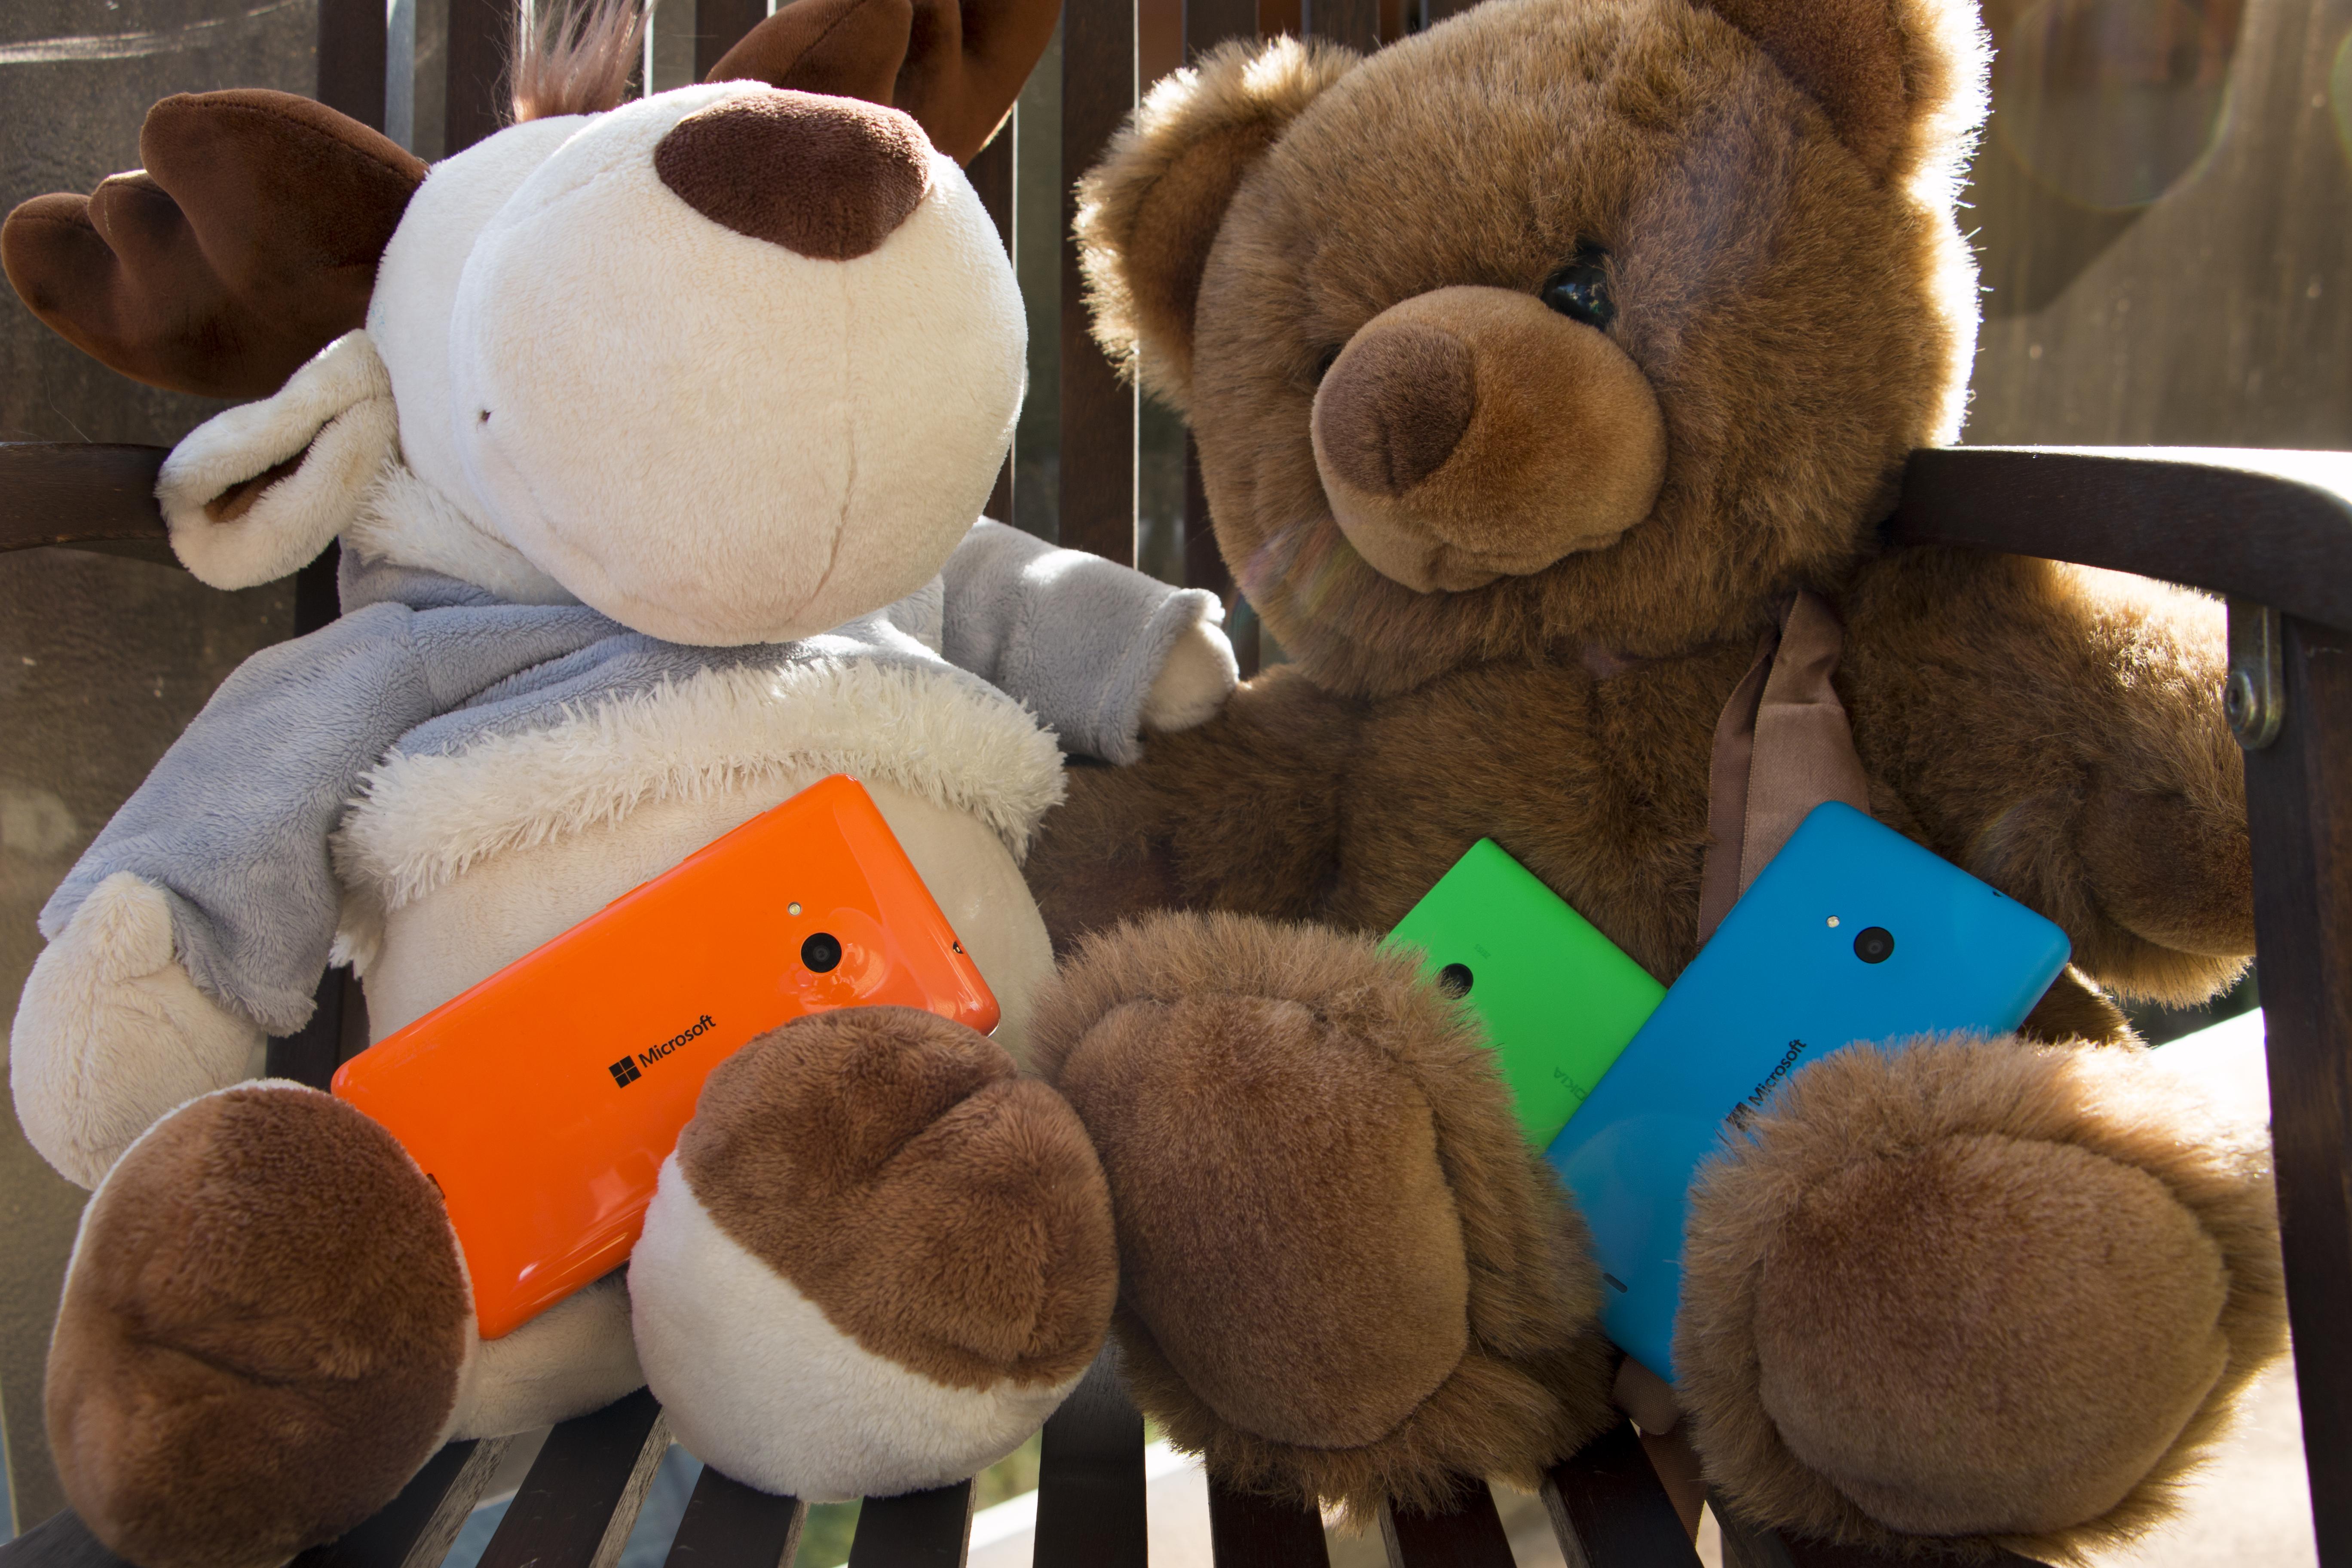 Microsoft Lumia 435 Smartphone Review Reviews Canon Eos Couple Teddies Bear 70d